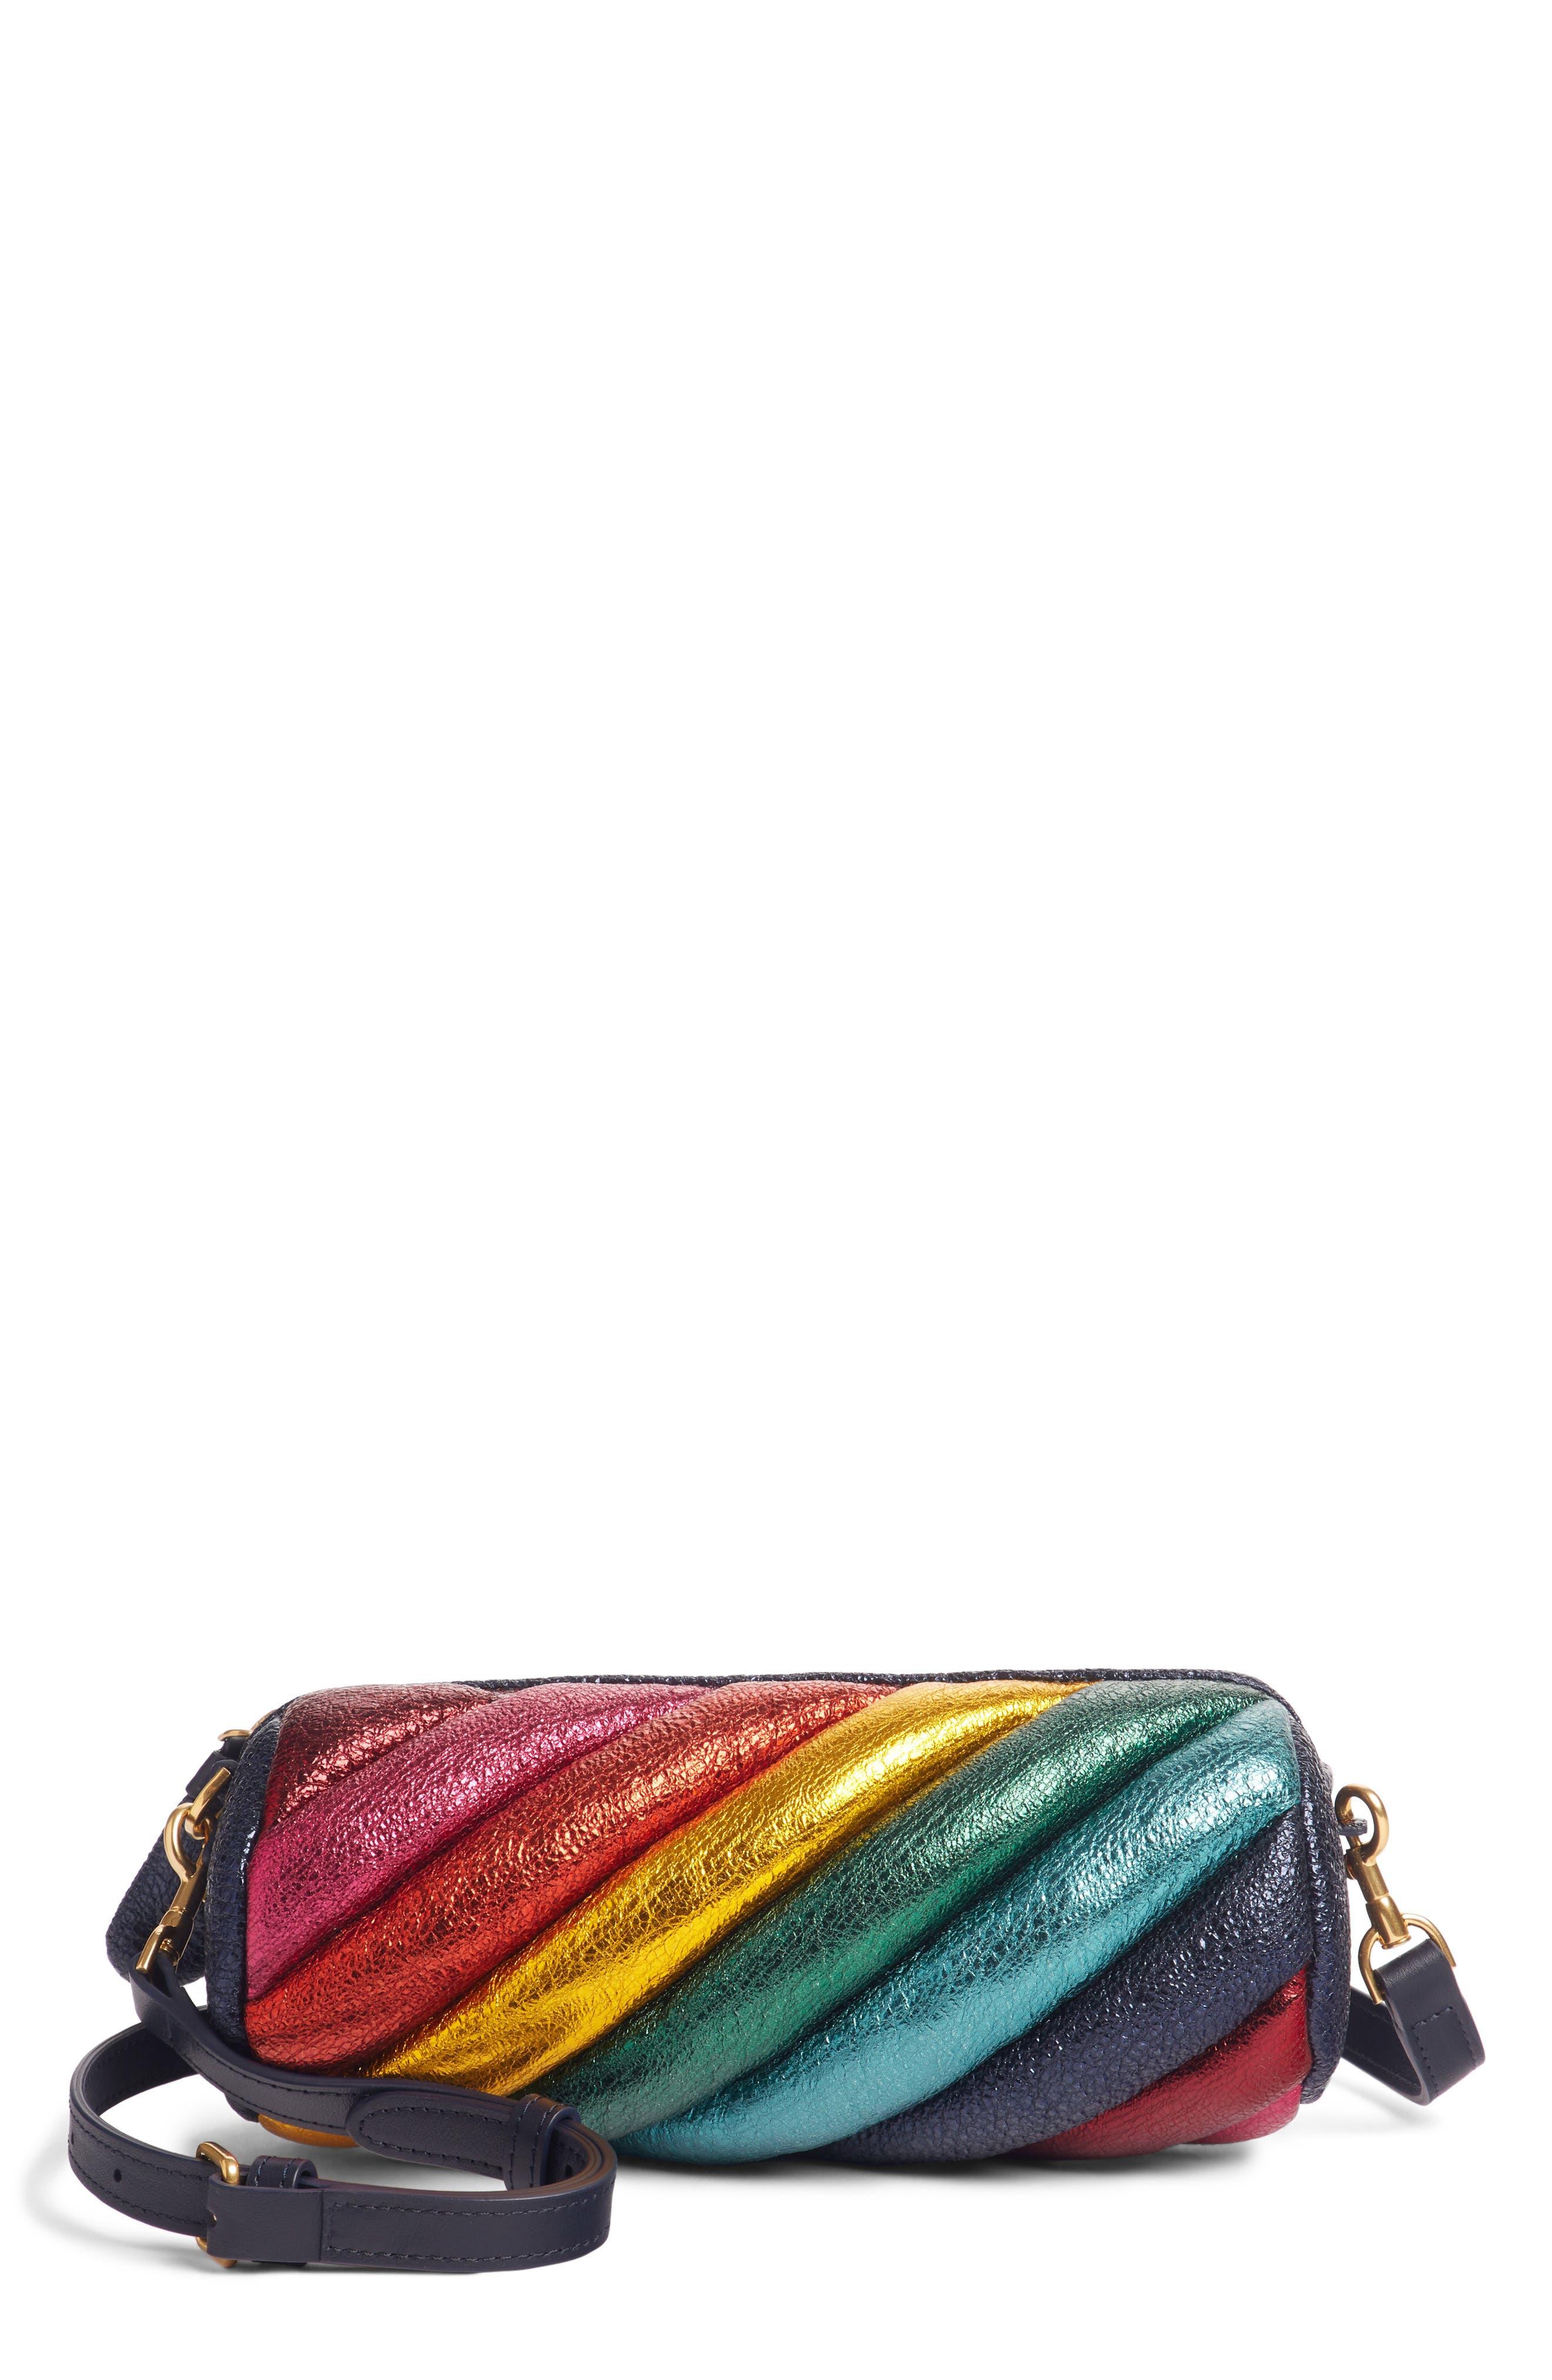 Marshmallow Twist Metallic Leather Crossbody Bag,                         Main,                         color, BLACK MULTI